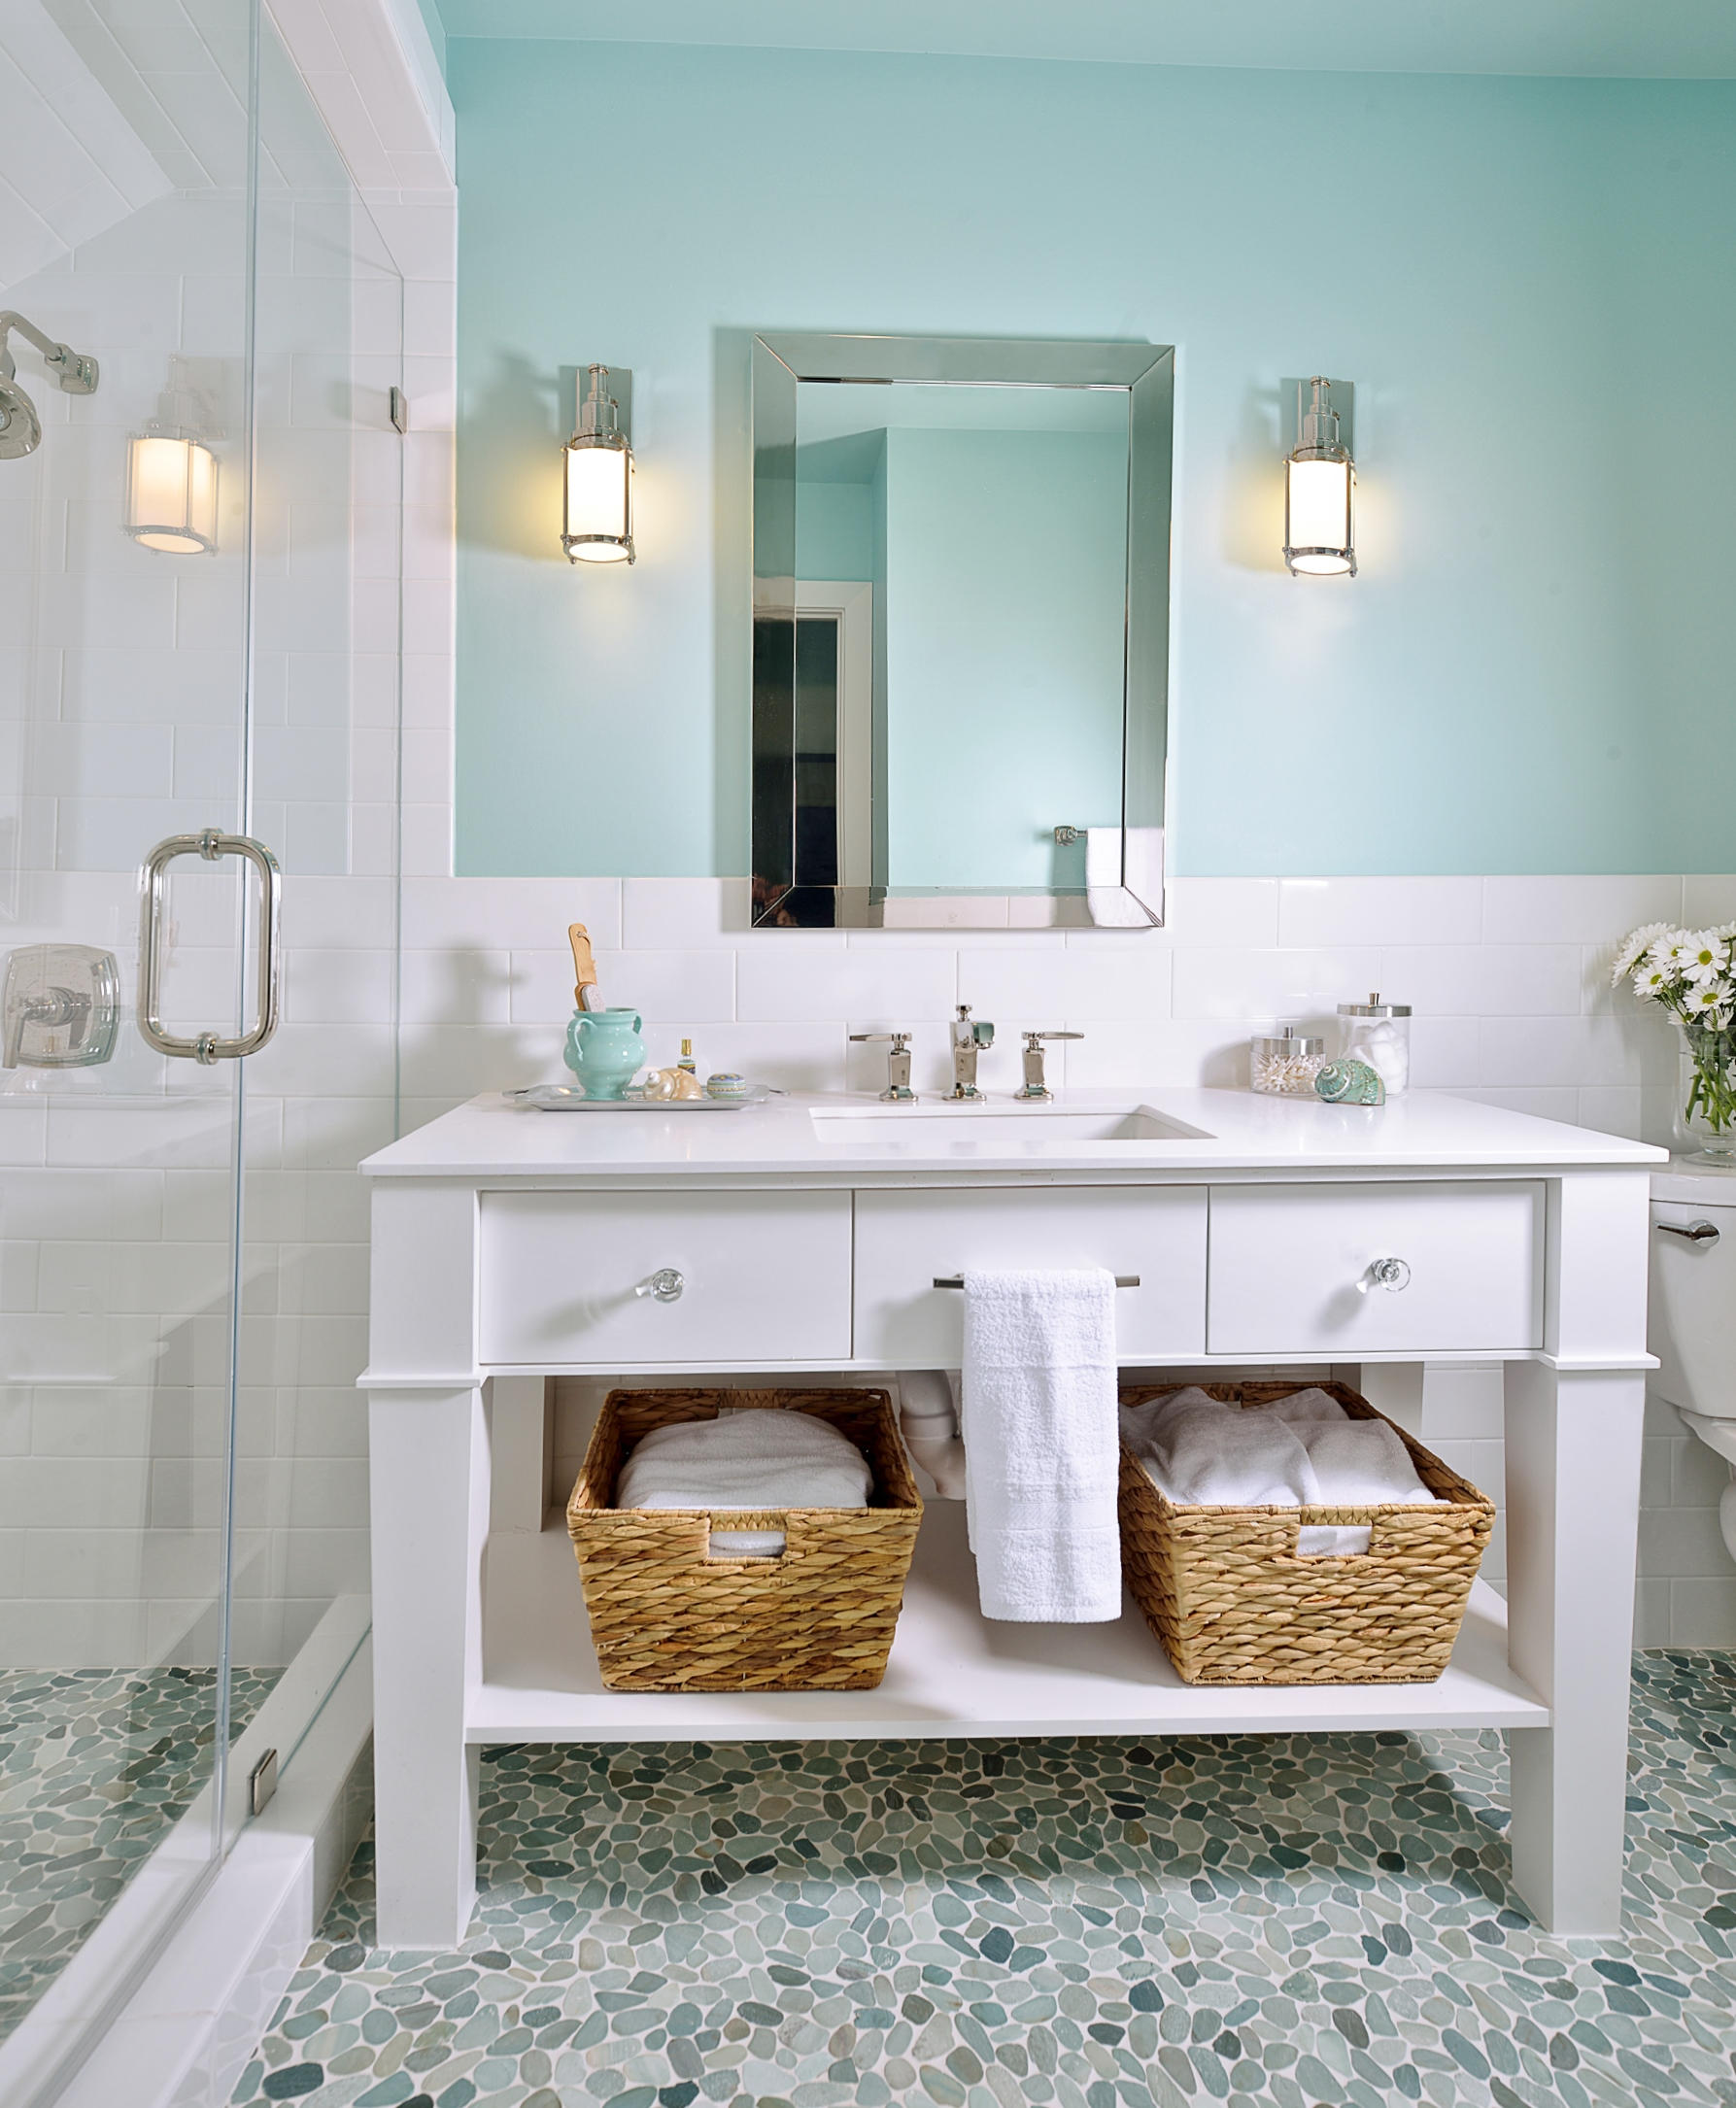 White Vanity In S Bathroom With Pebble Tile Floor Carla Aston Designer